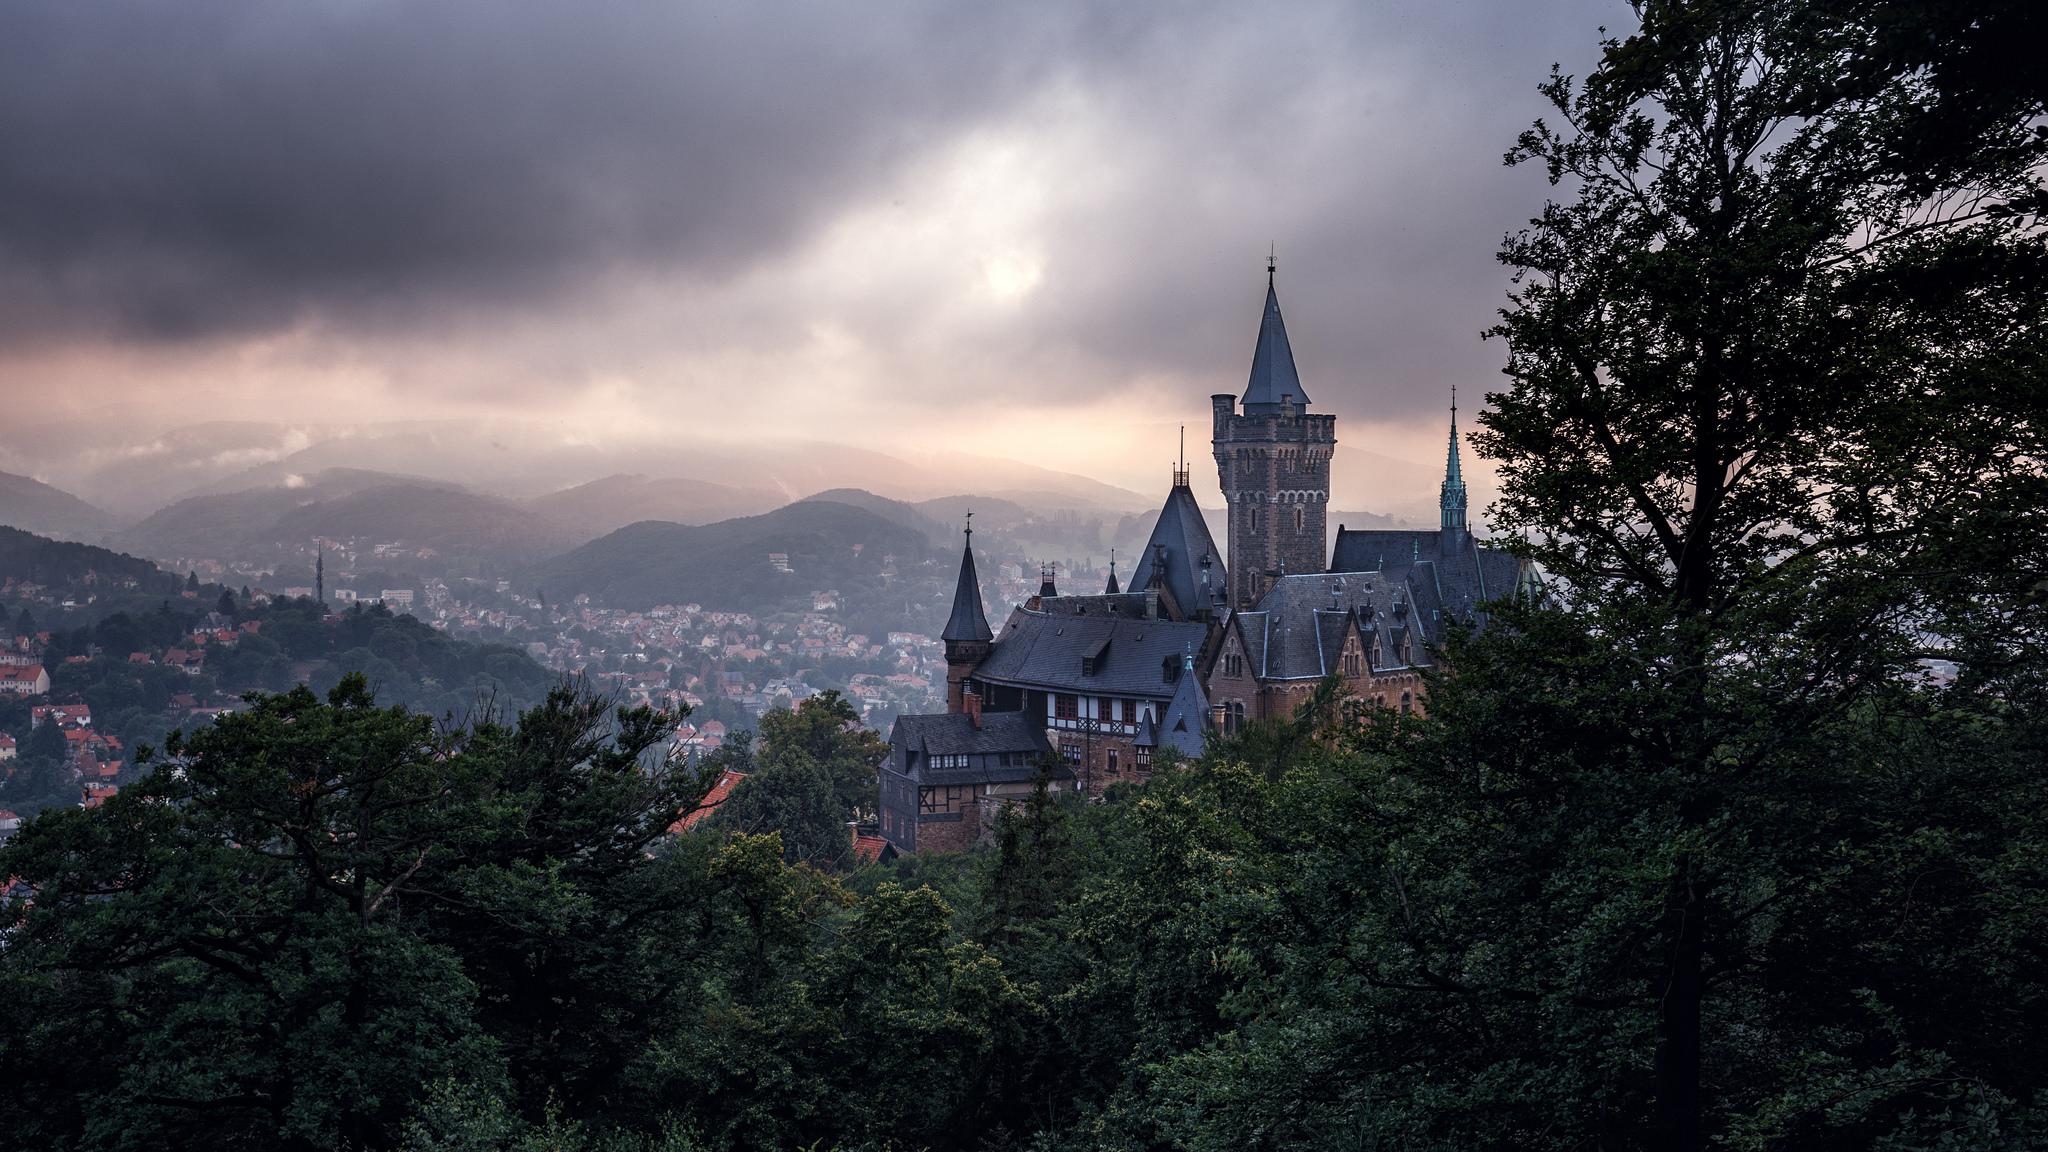 Schloss Wernigerode, Germany